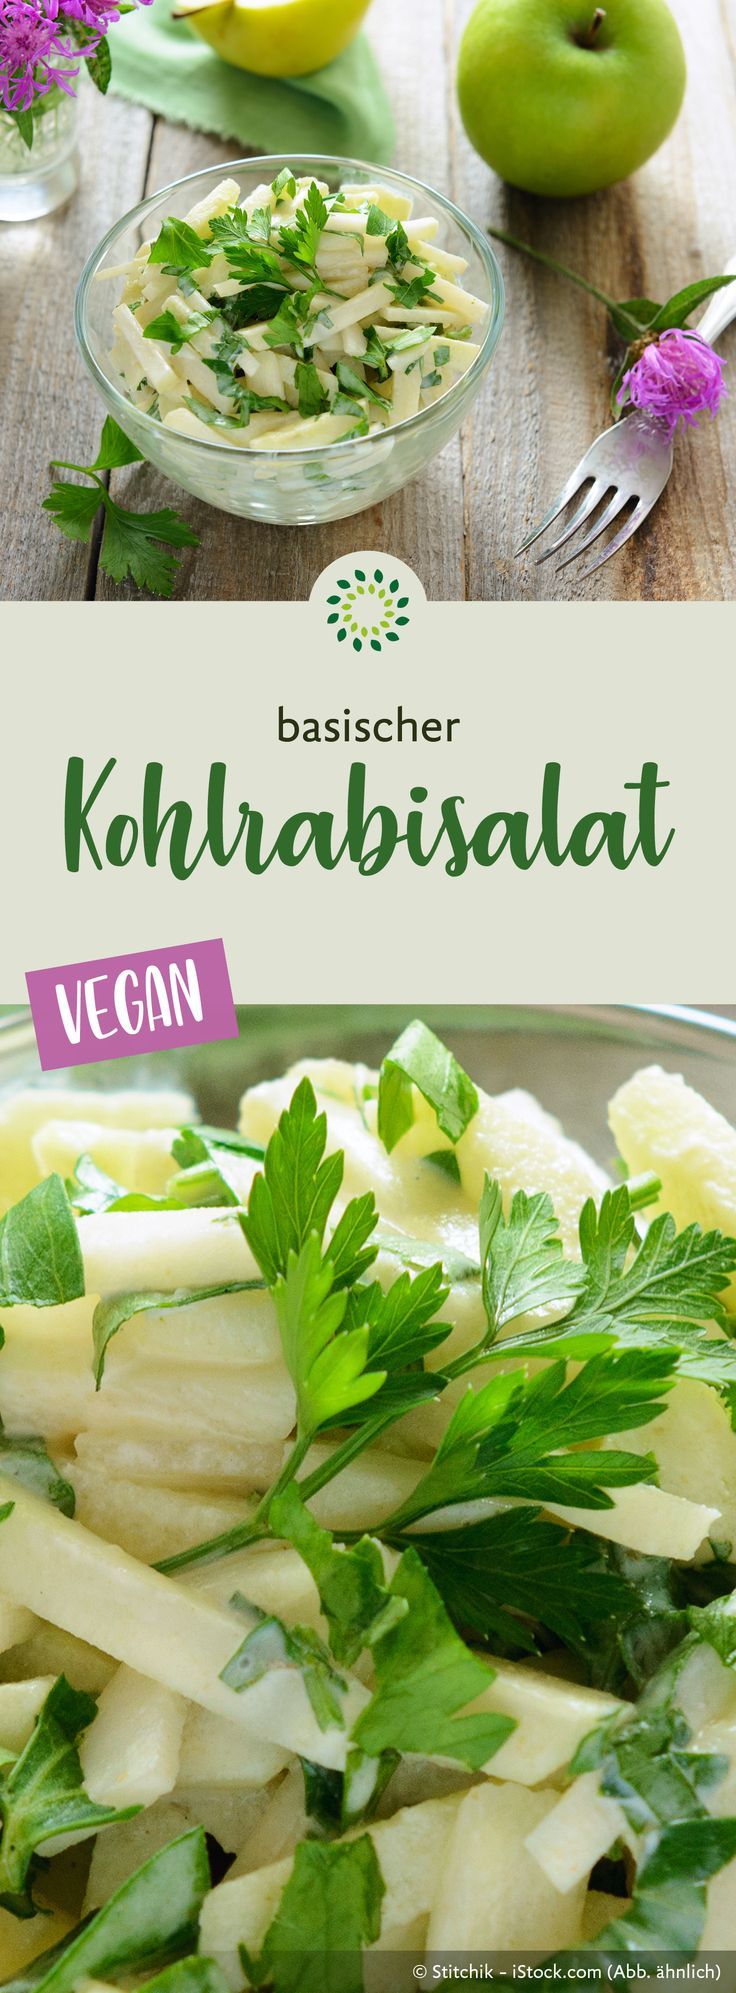 Probieren Sie unbedingt: Einfacher Kohlrabi-Salat #Rezept #vegan #Kohlrabi #Basic # …   – Food & Drink ideas